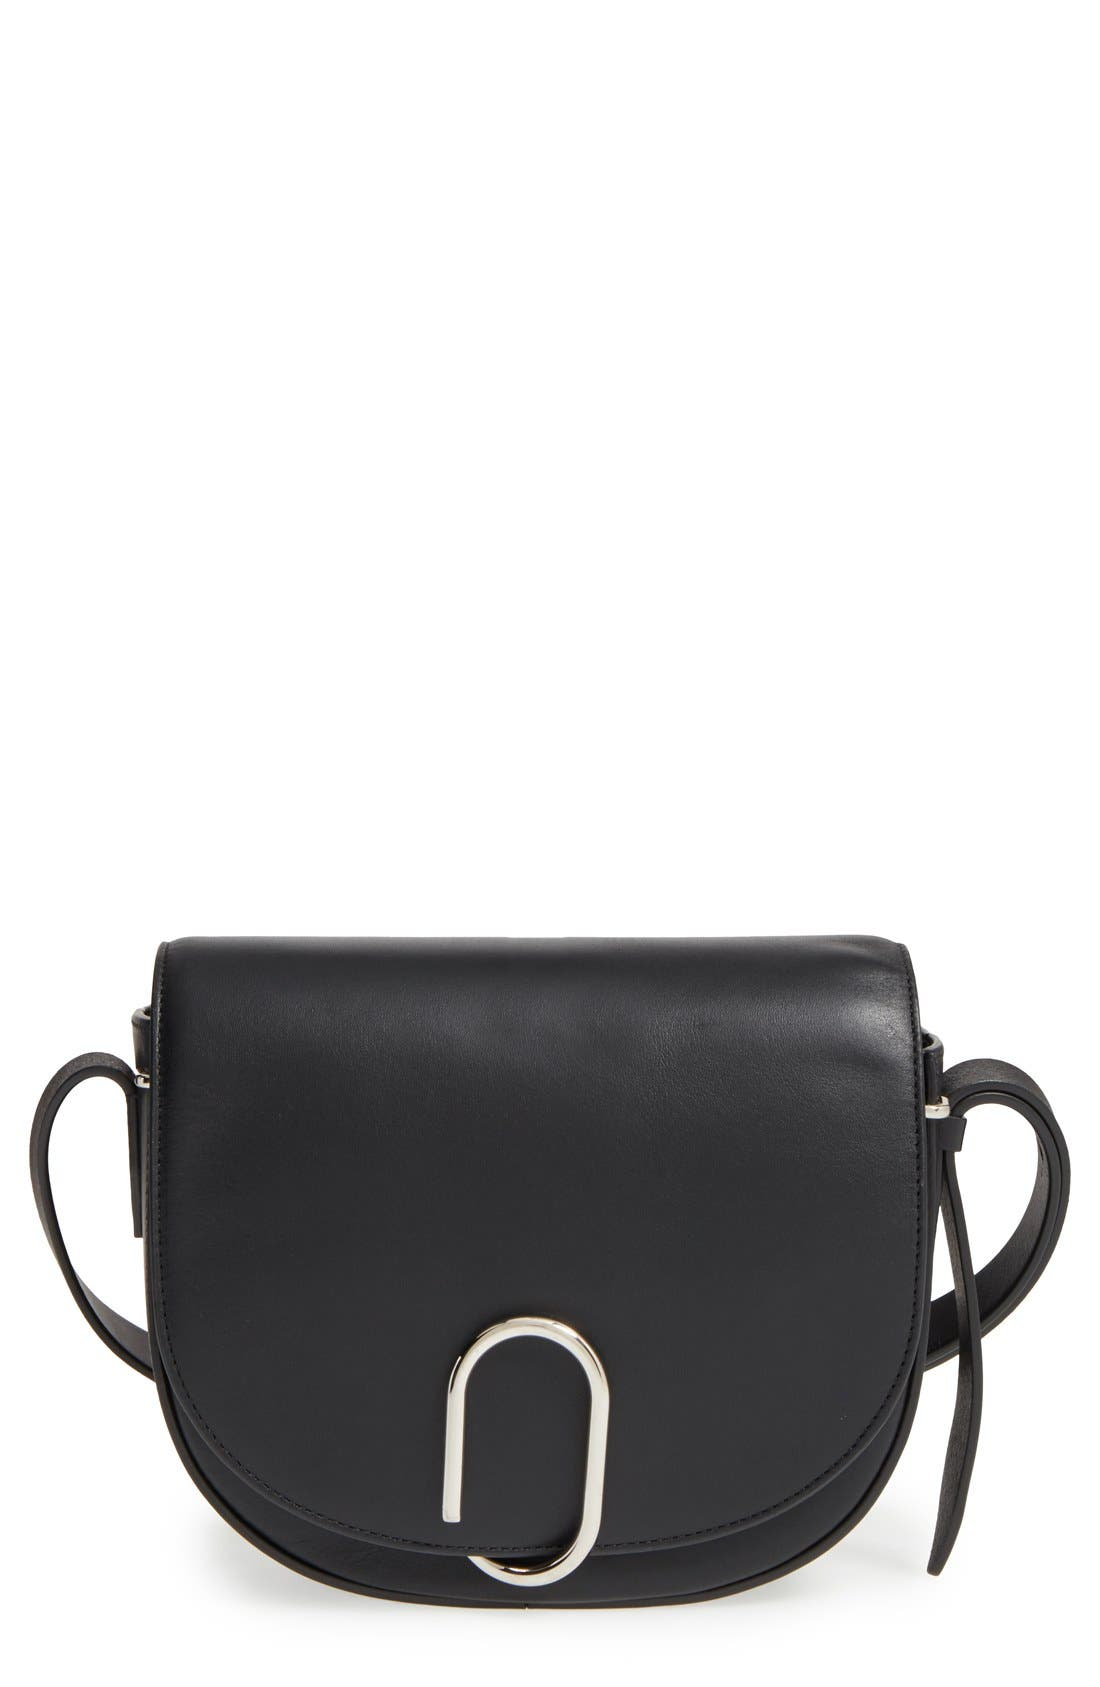 Alix Leather Saddle Bag,                             Main thumbnail 1, color,                             001